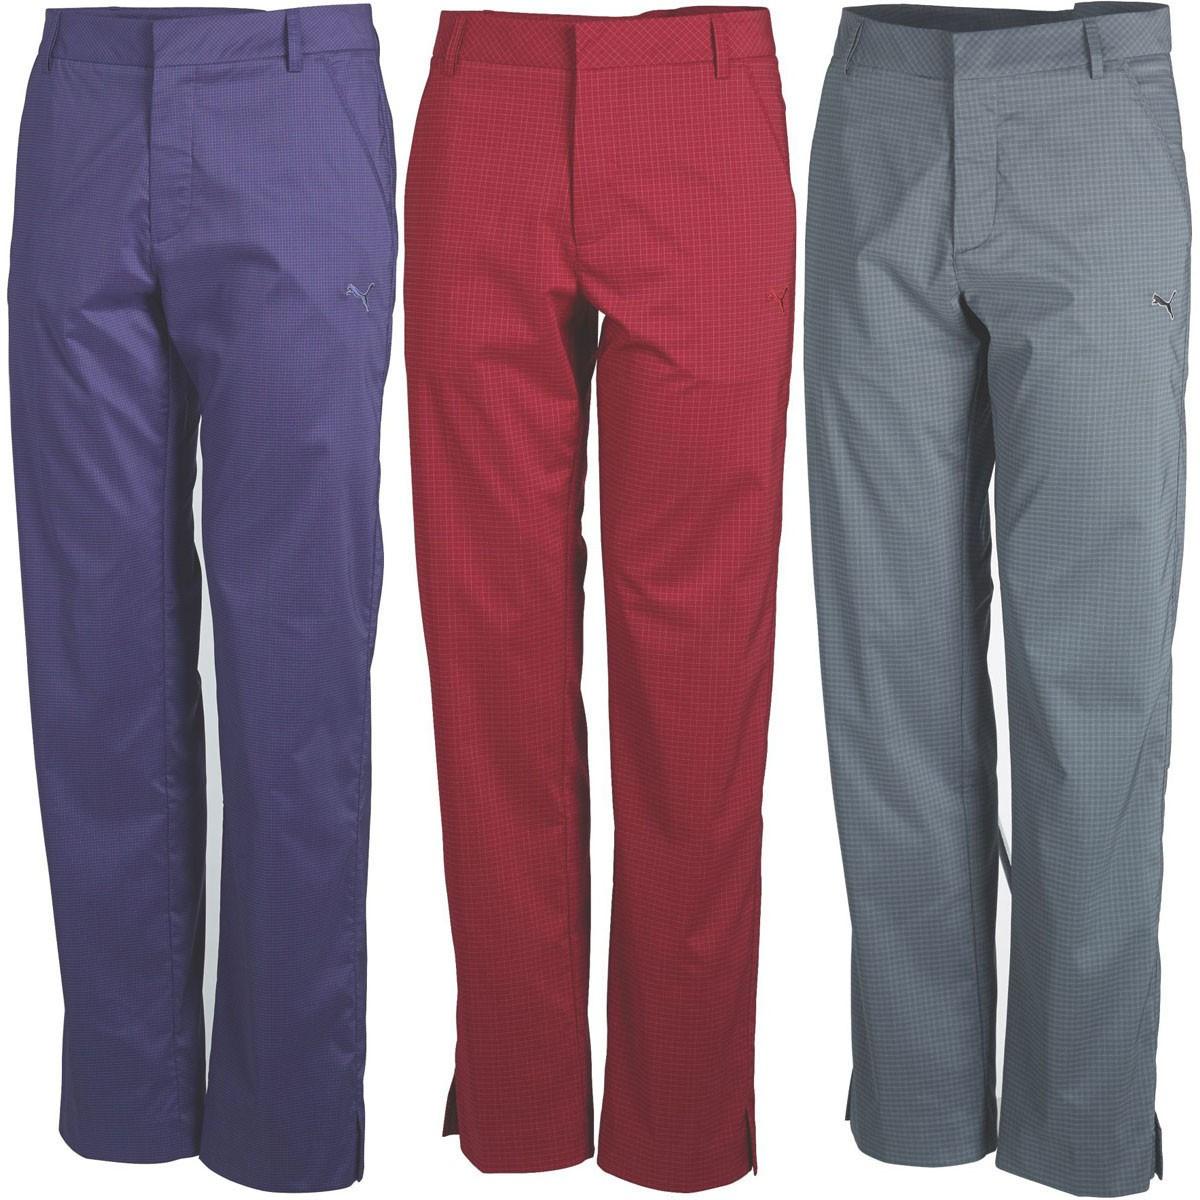 6748fc0160ae Puma Golf Mens Plaid Tech Style Pant Mini Check Golf Trousers - Puma ...